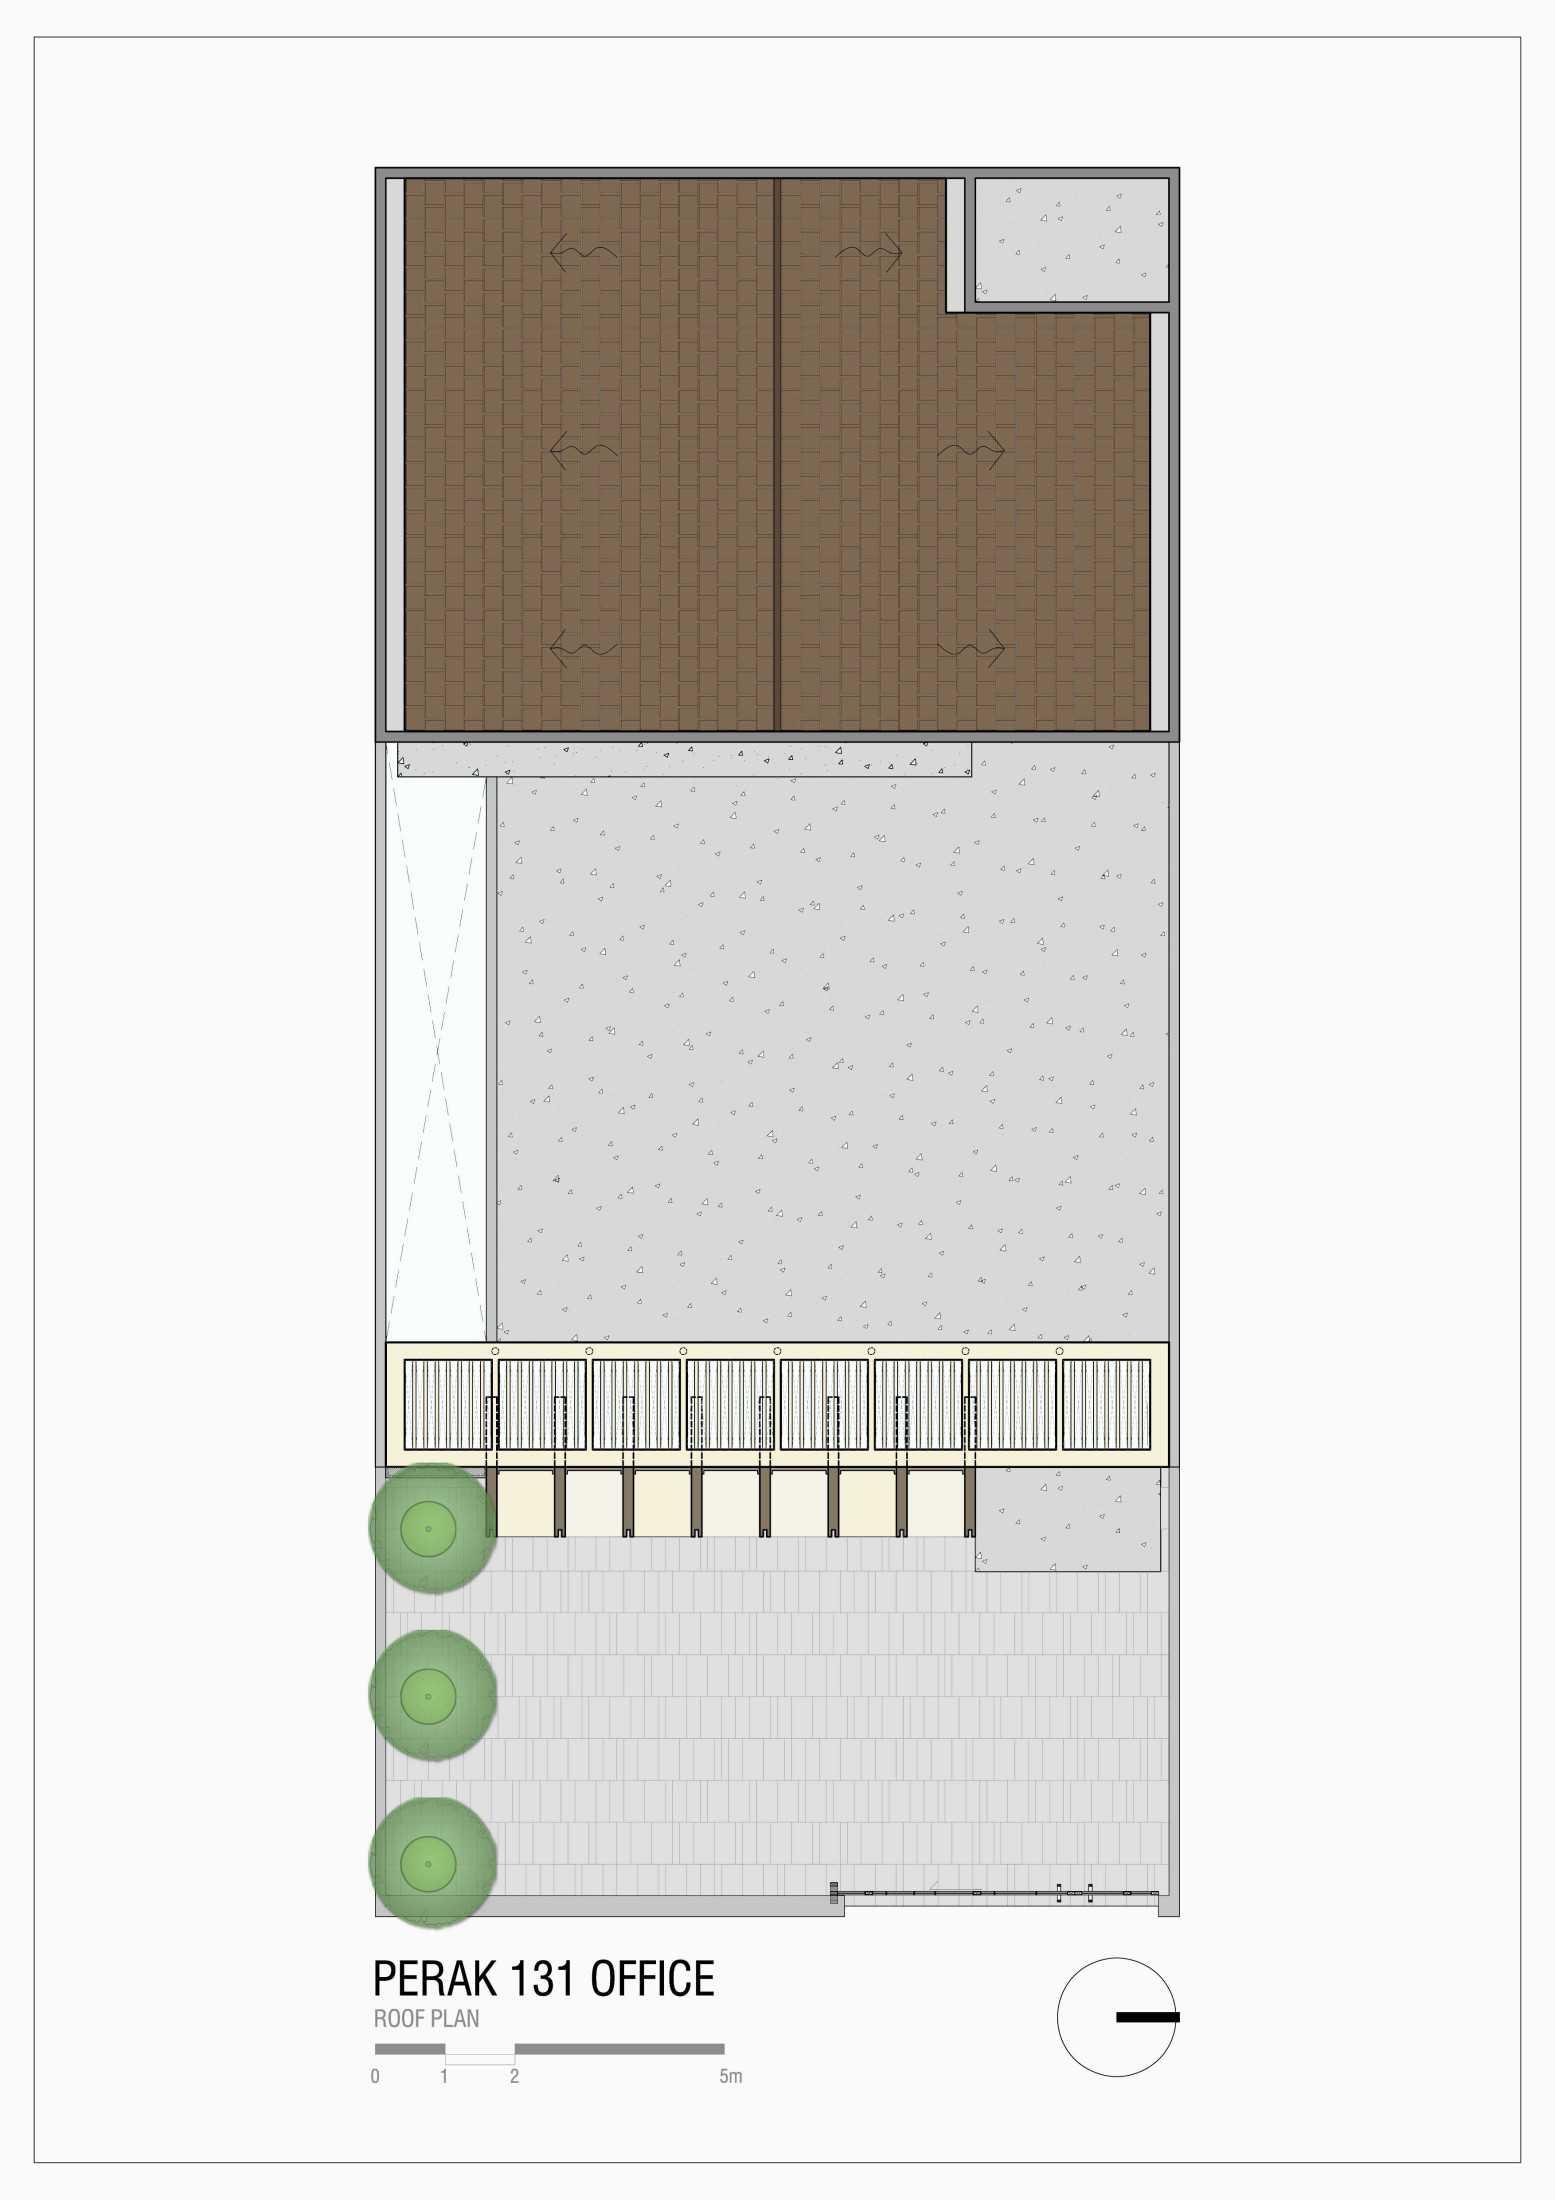 Simple Projects Architecture Pb131 Office Jl.perak Barat 131, Surabaya - Indonesia Jl.perak Barat 131, Surabaya - Indonesia Simple-Projects-Architecture-Pb131-Office  59152